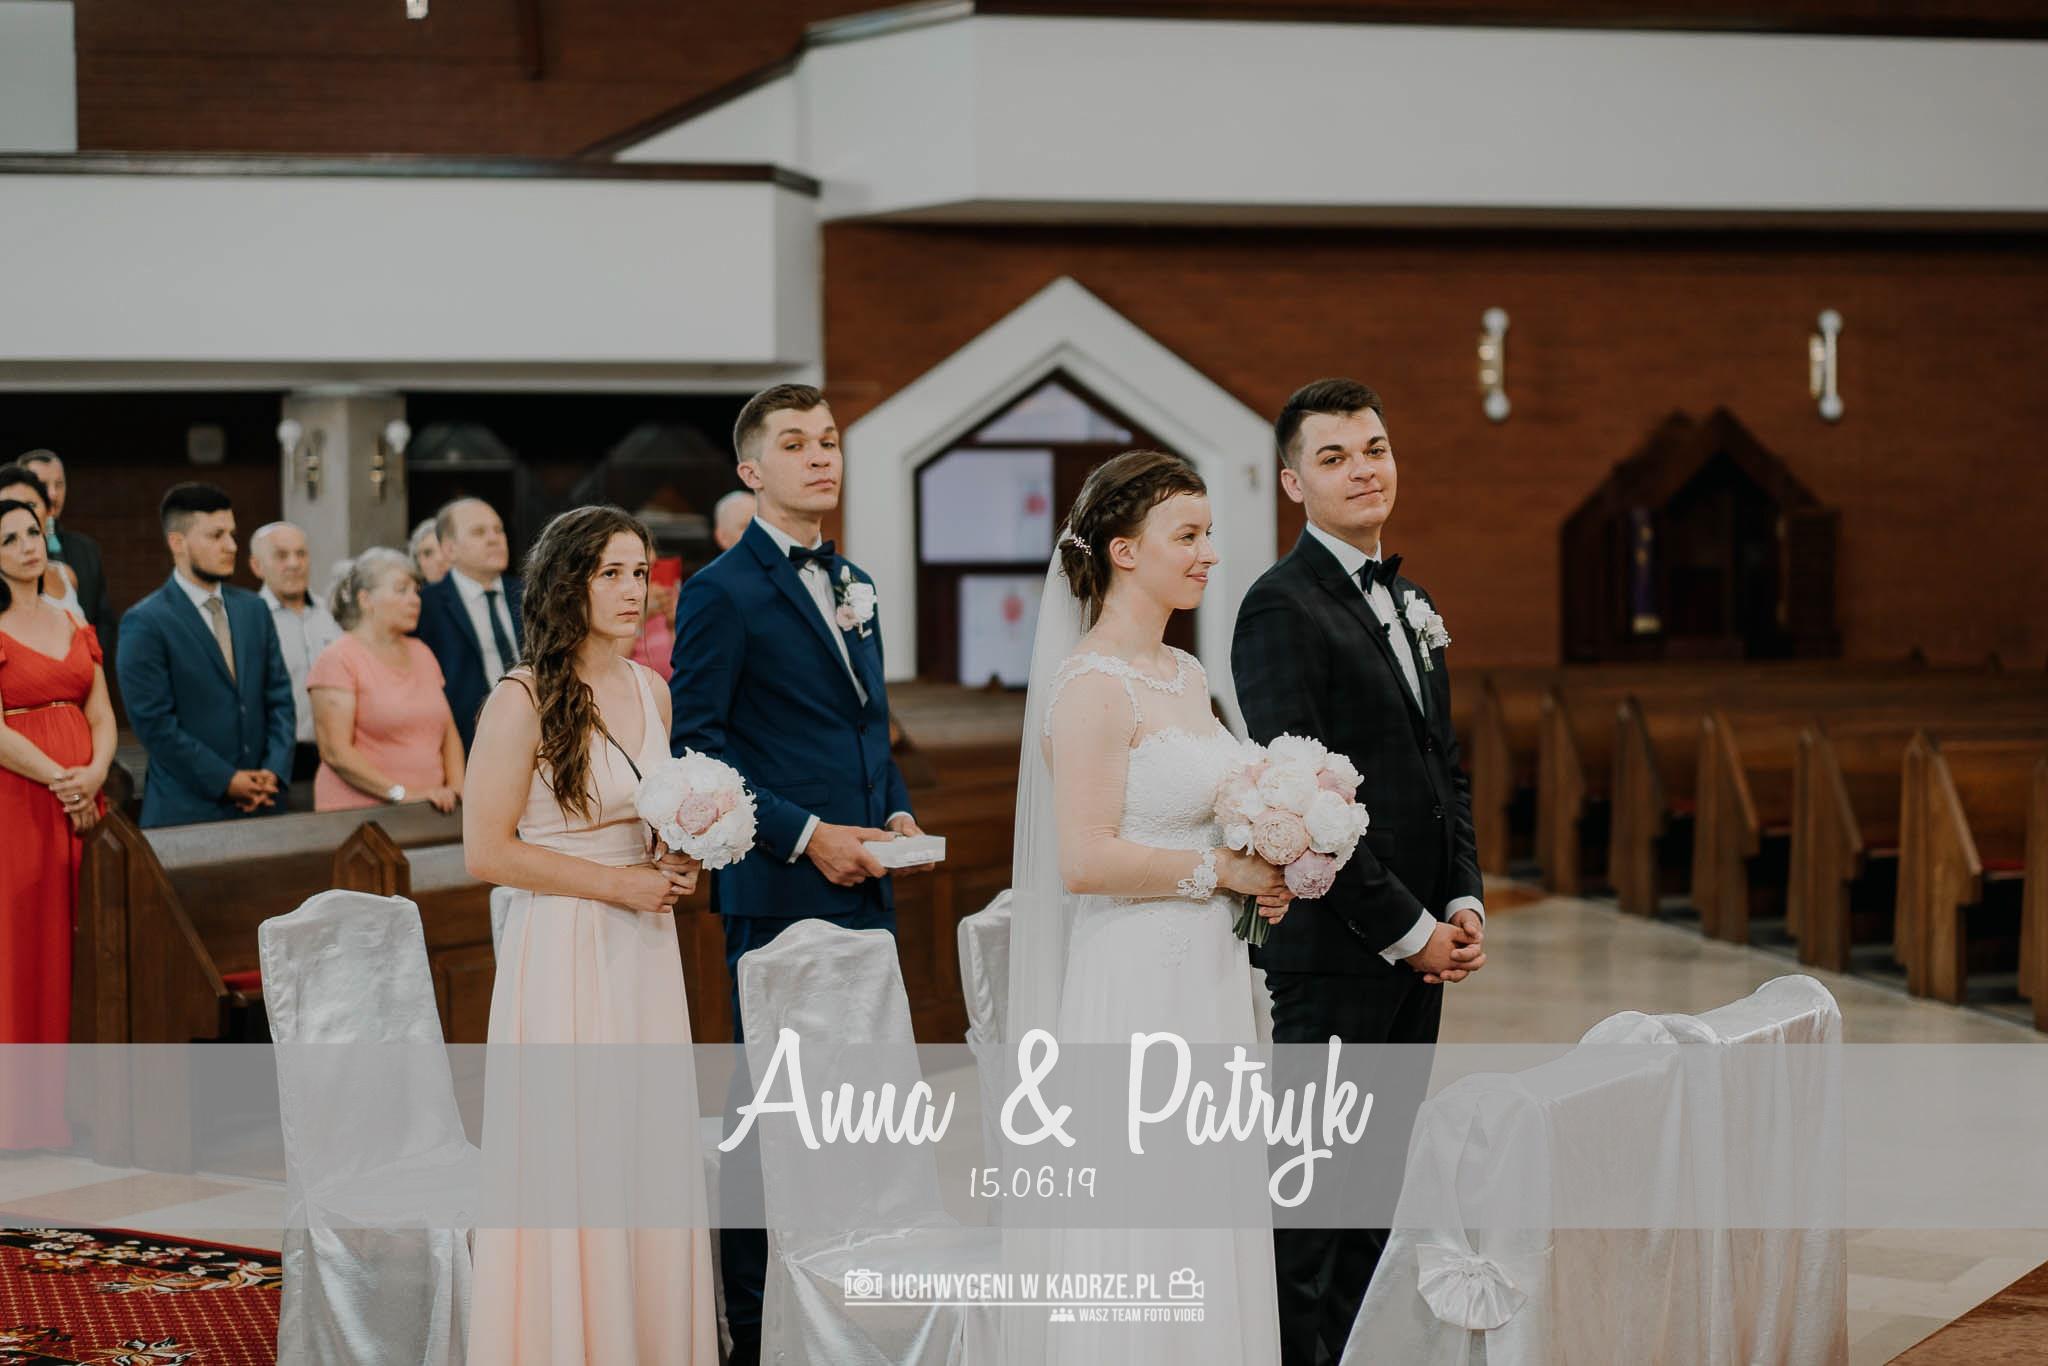 Anna i Patryk | Reportaż Ślubny + Teledysk Ślubny | Lublin